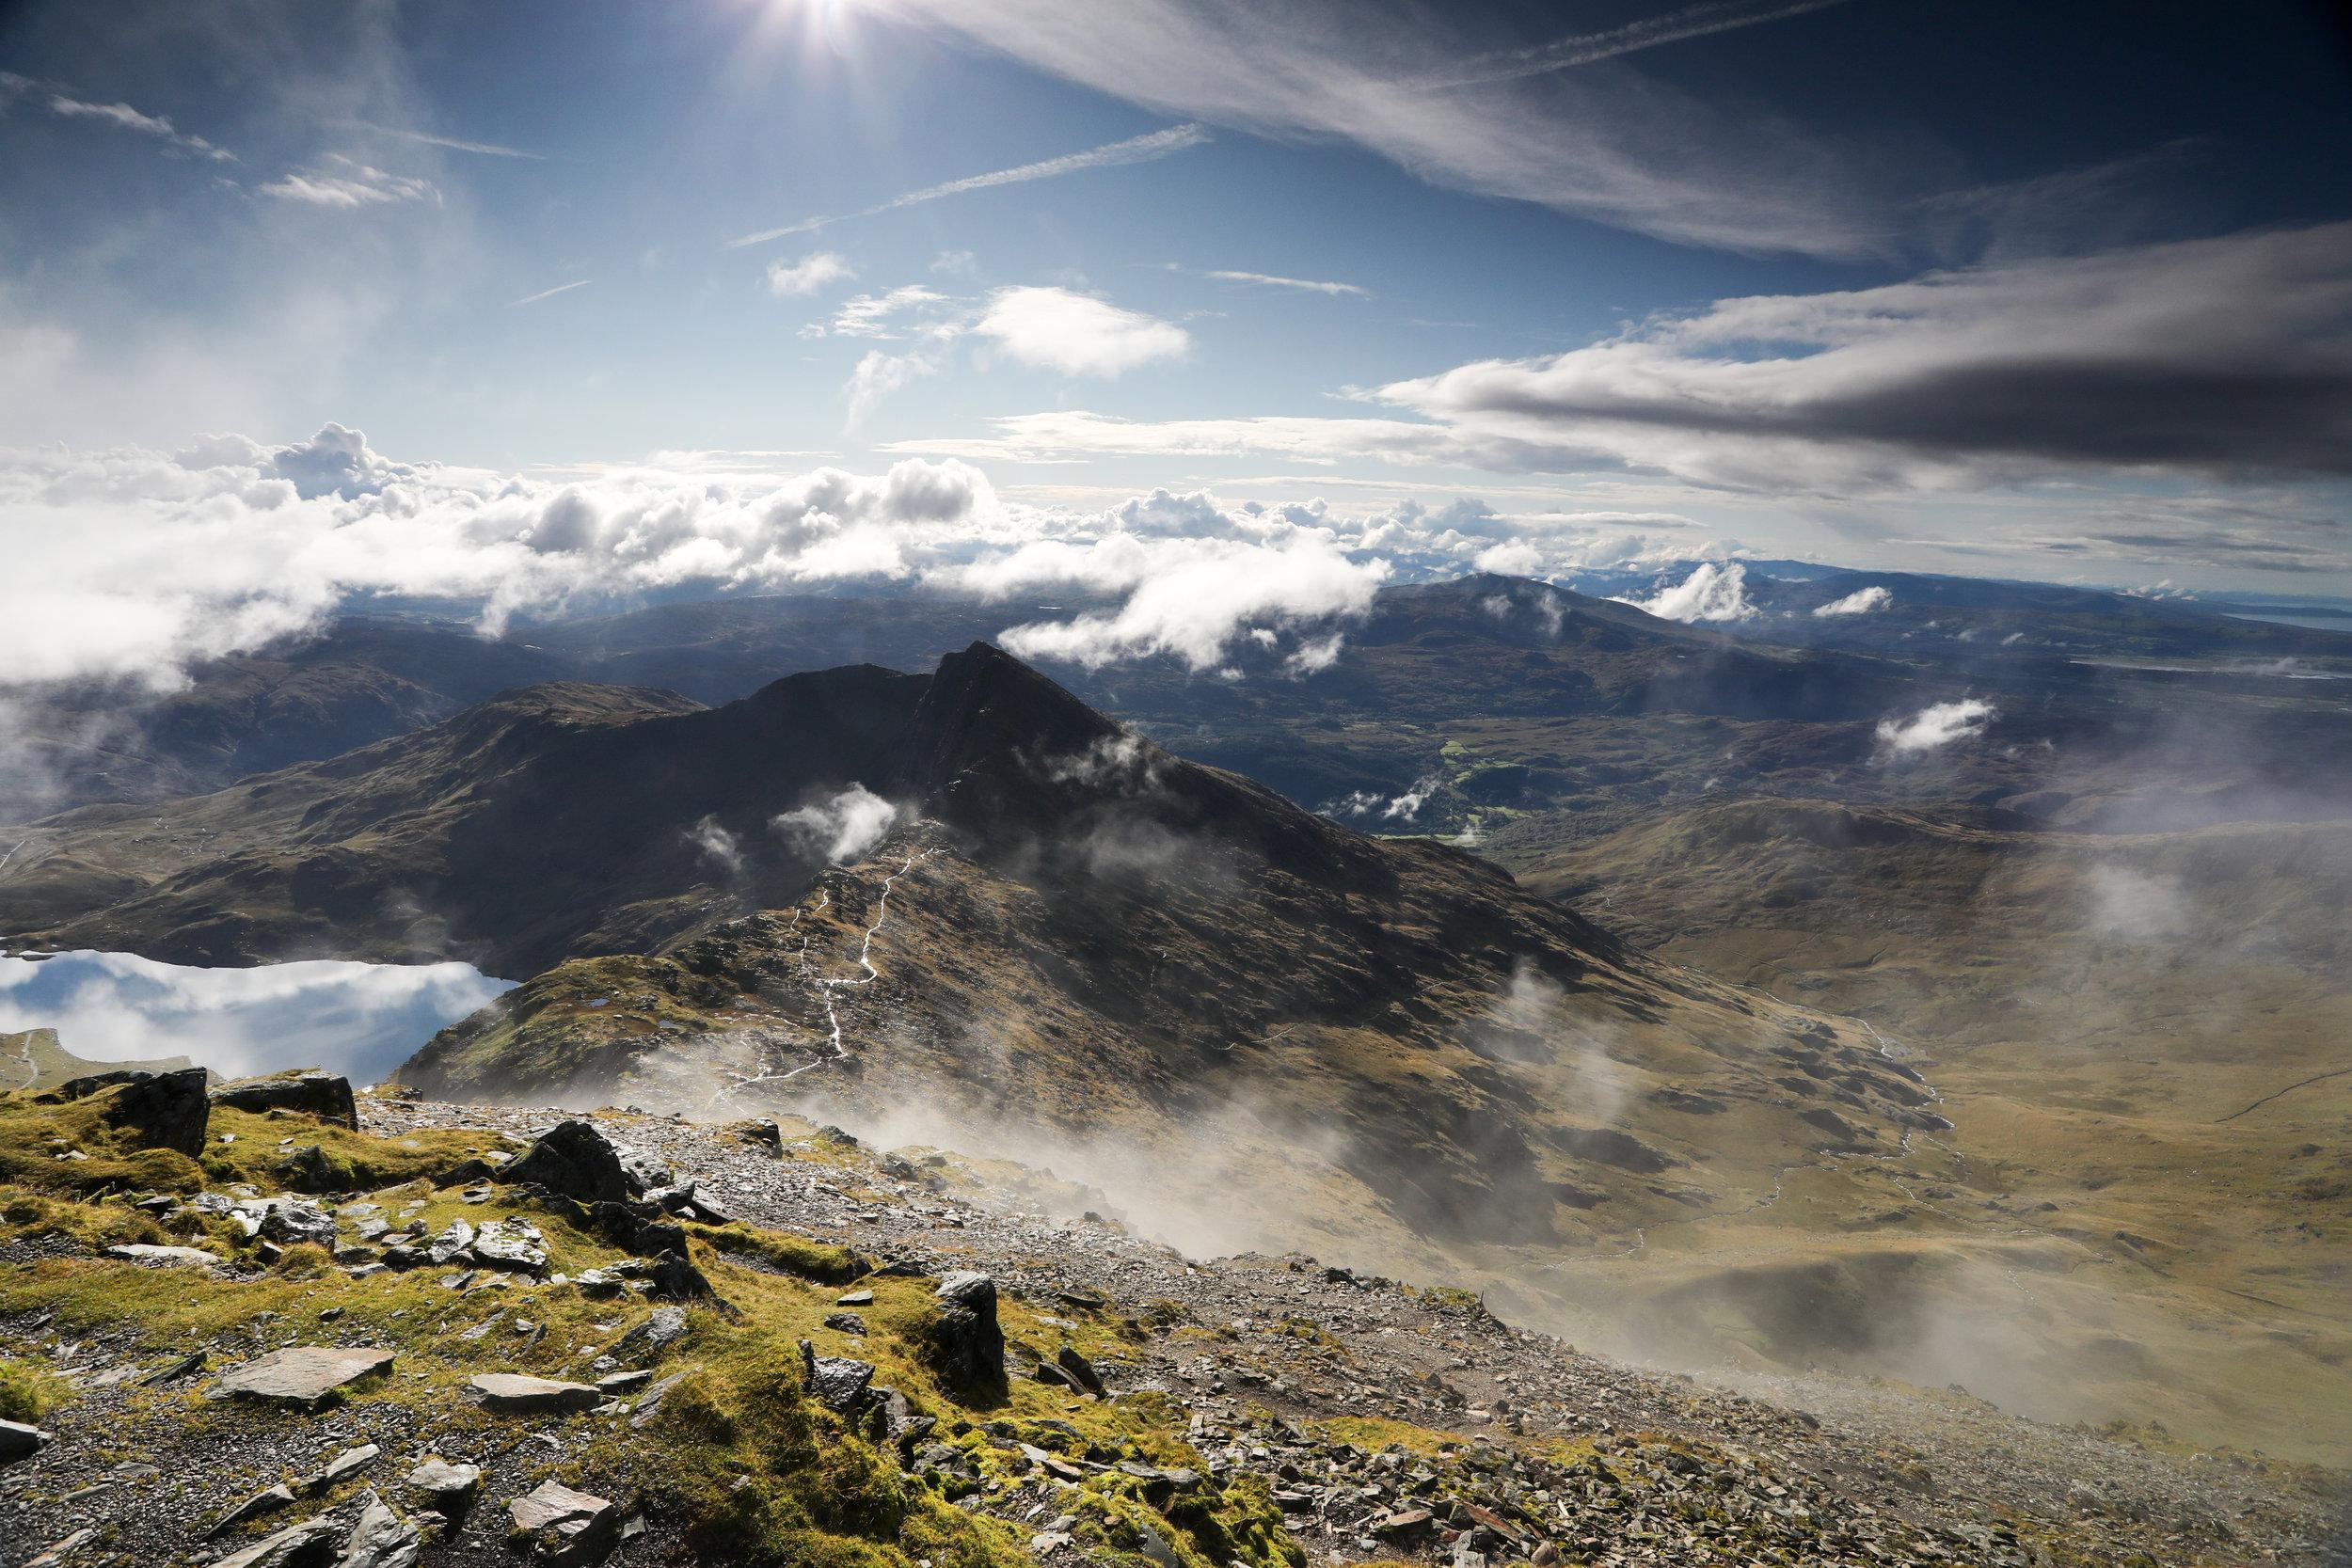 Mountain adventure. Taylor Wimpey, Salomon, Invesco Perpetual, Arc'teryx, Suunto.